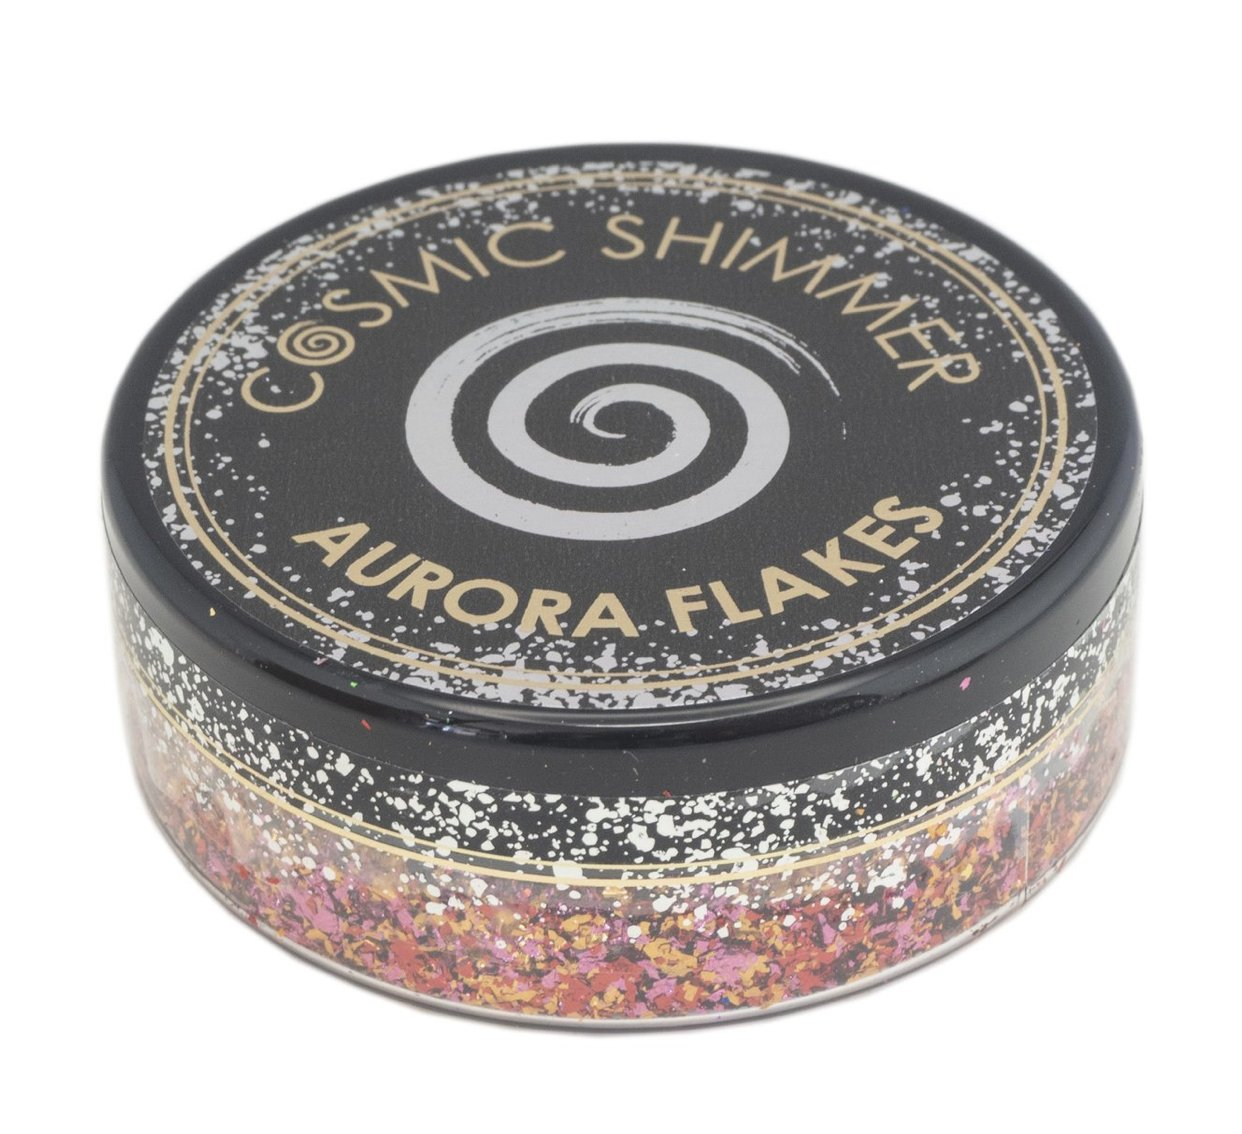 Aurora Flakes- Amber Glow